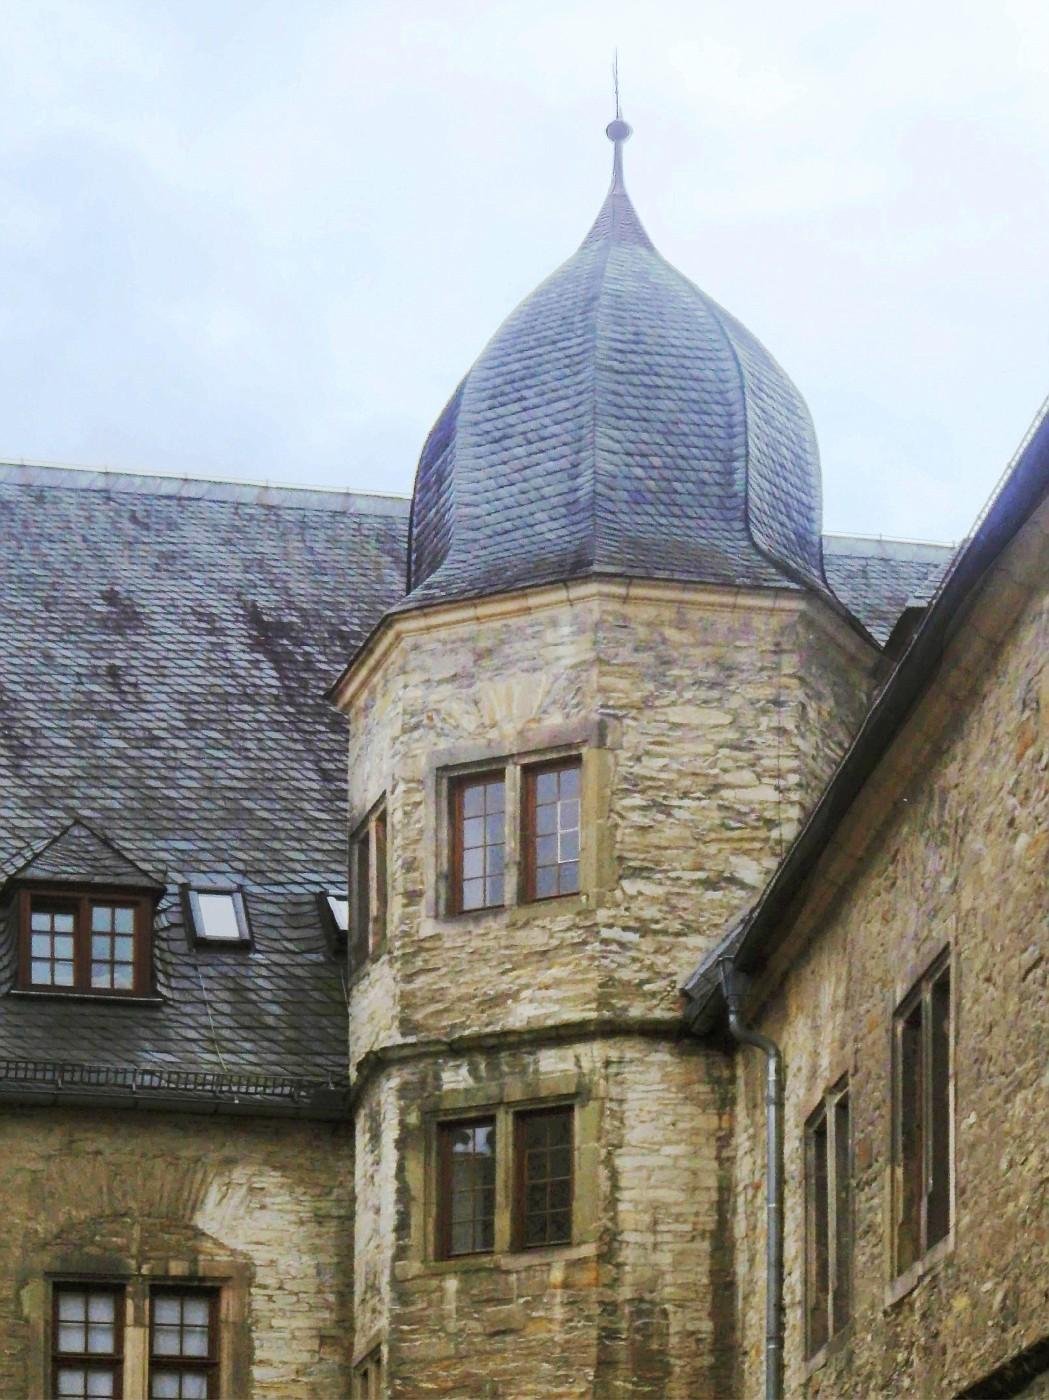 Innerer Treppenturm der Wewelsburg